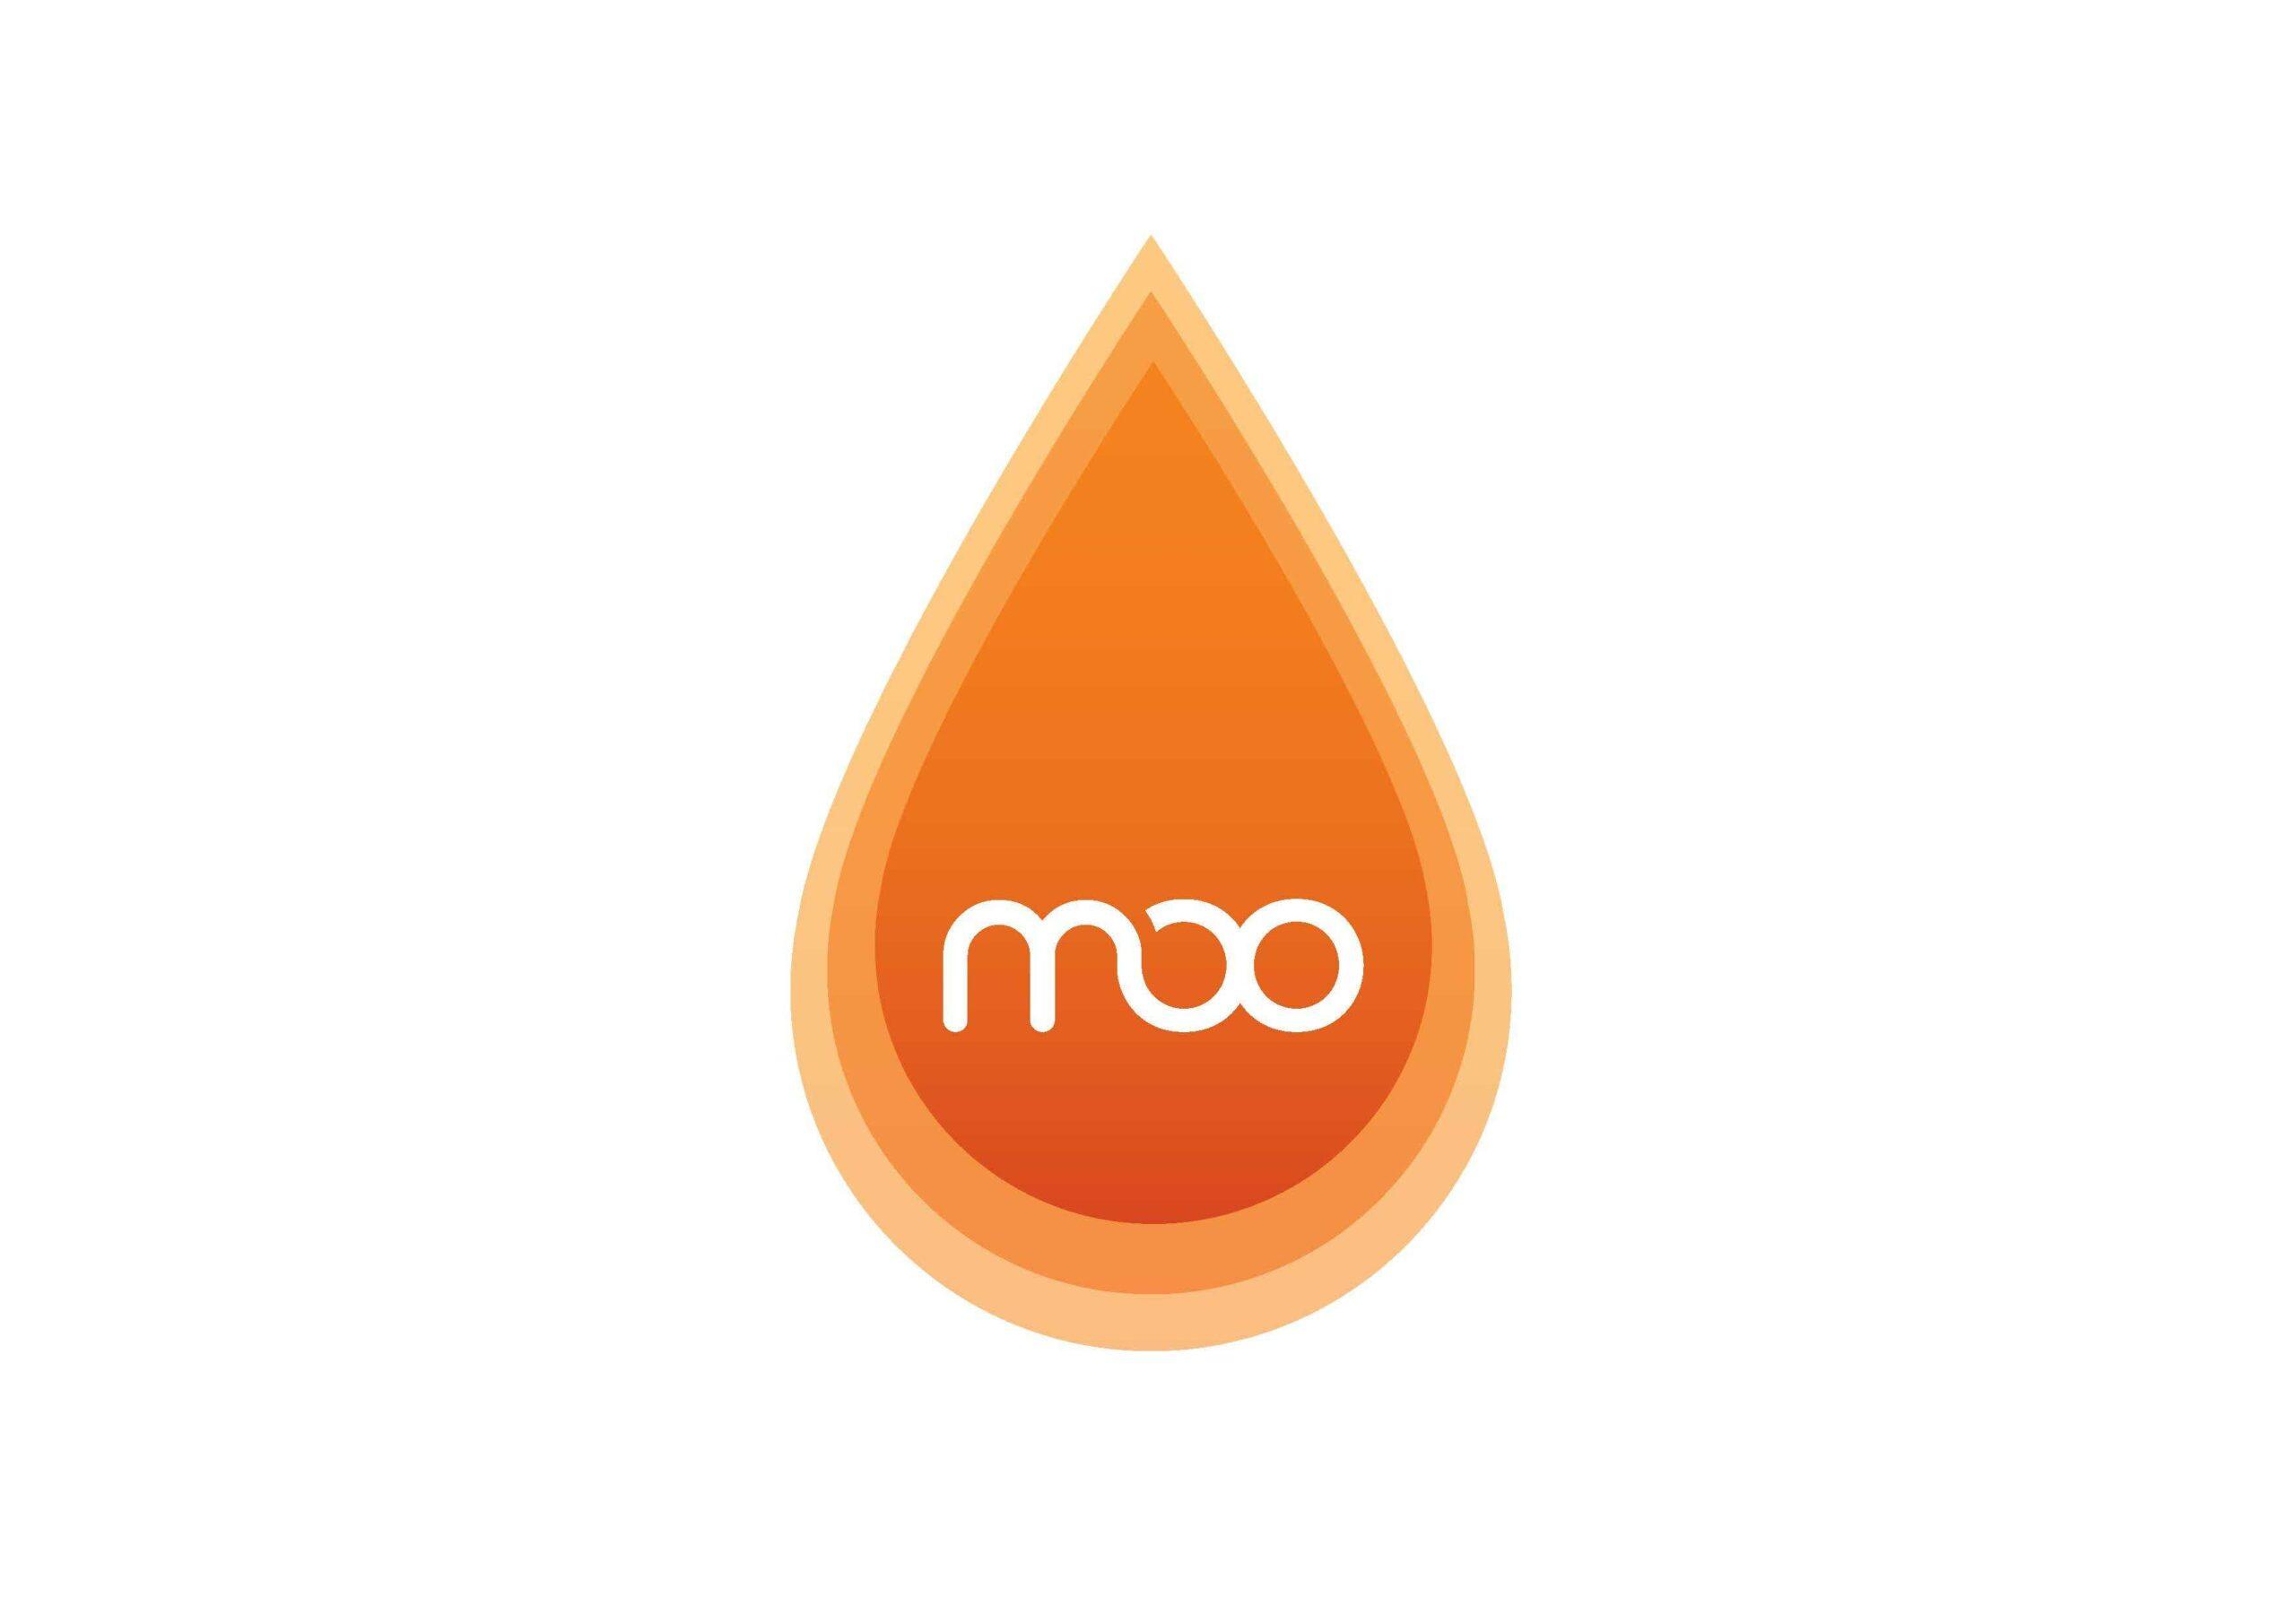 20 Oct Moo at Sewtopia Salt Lake